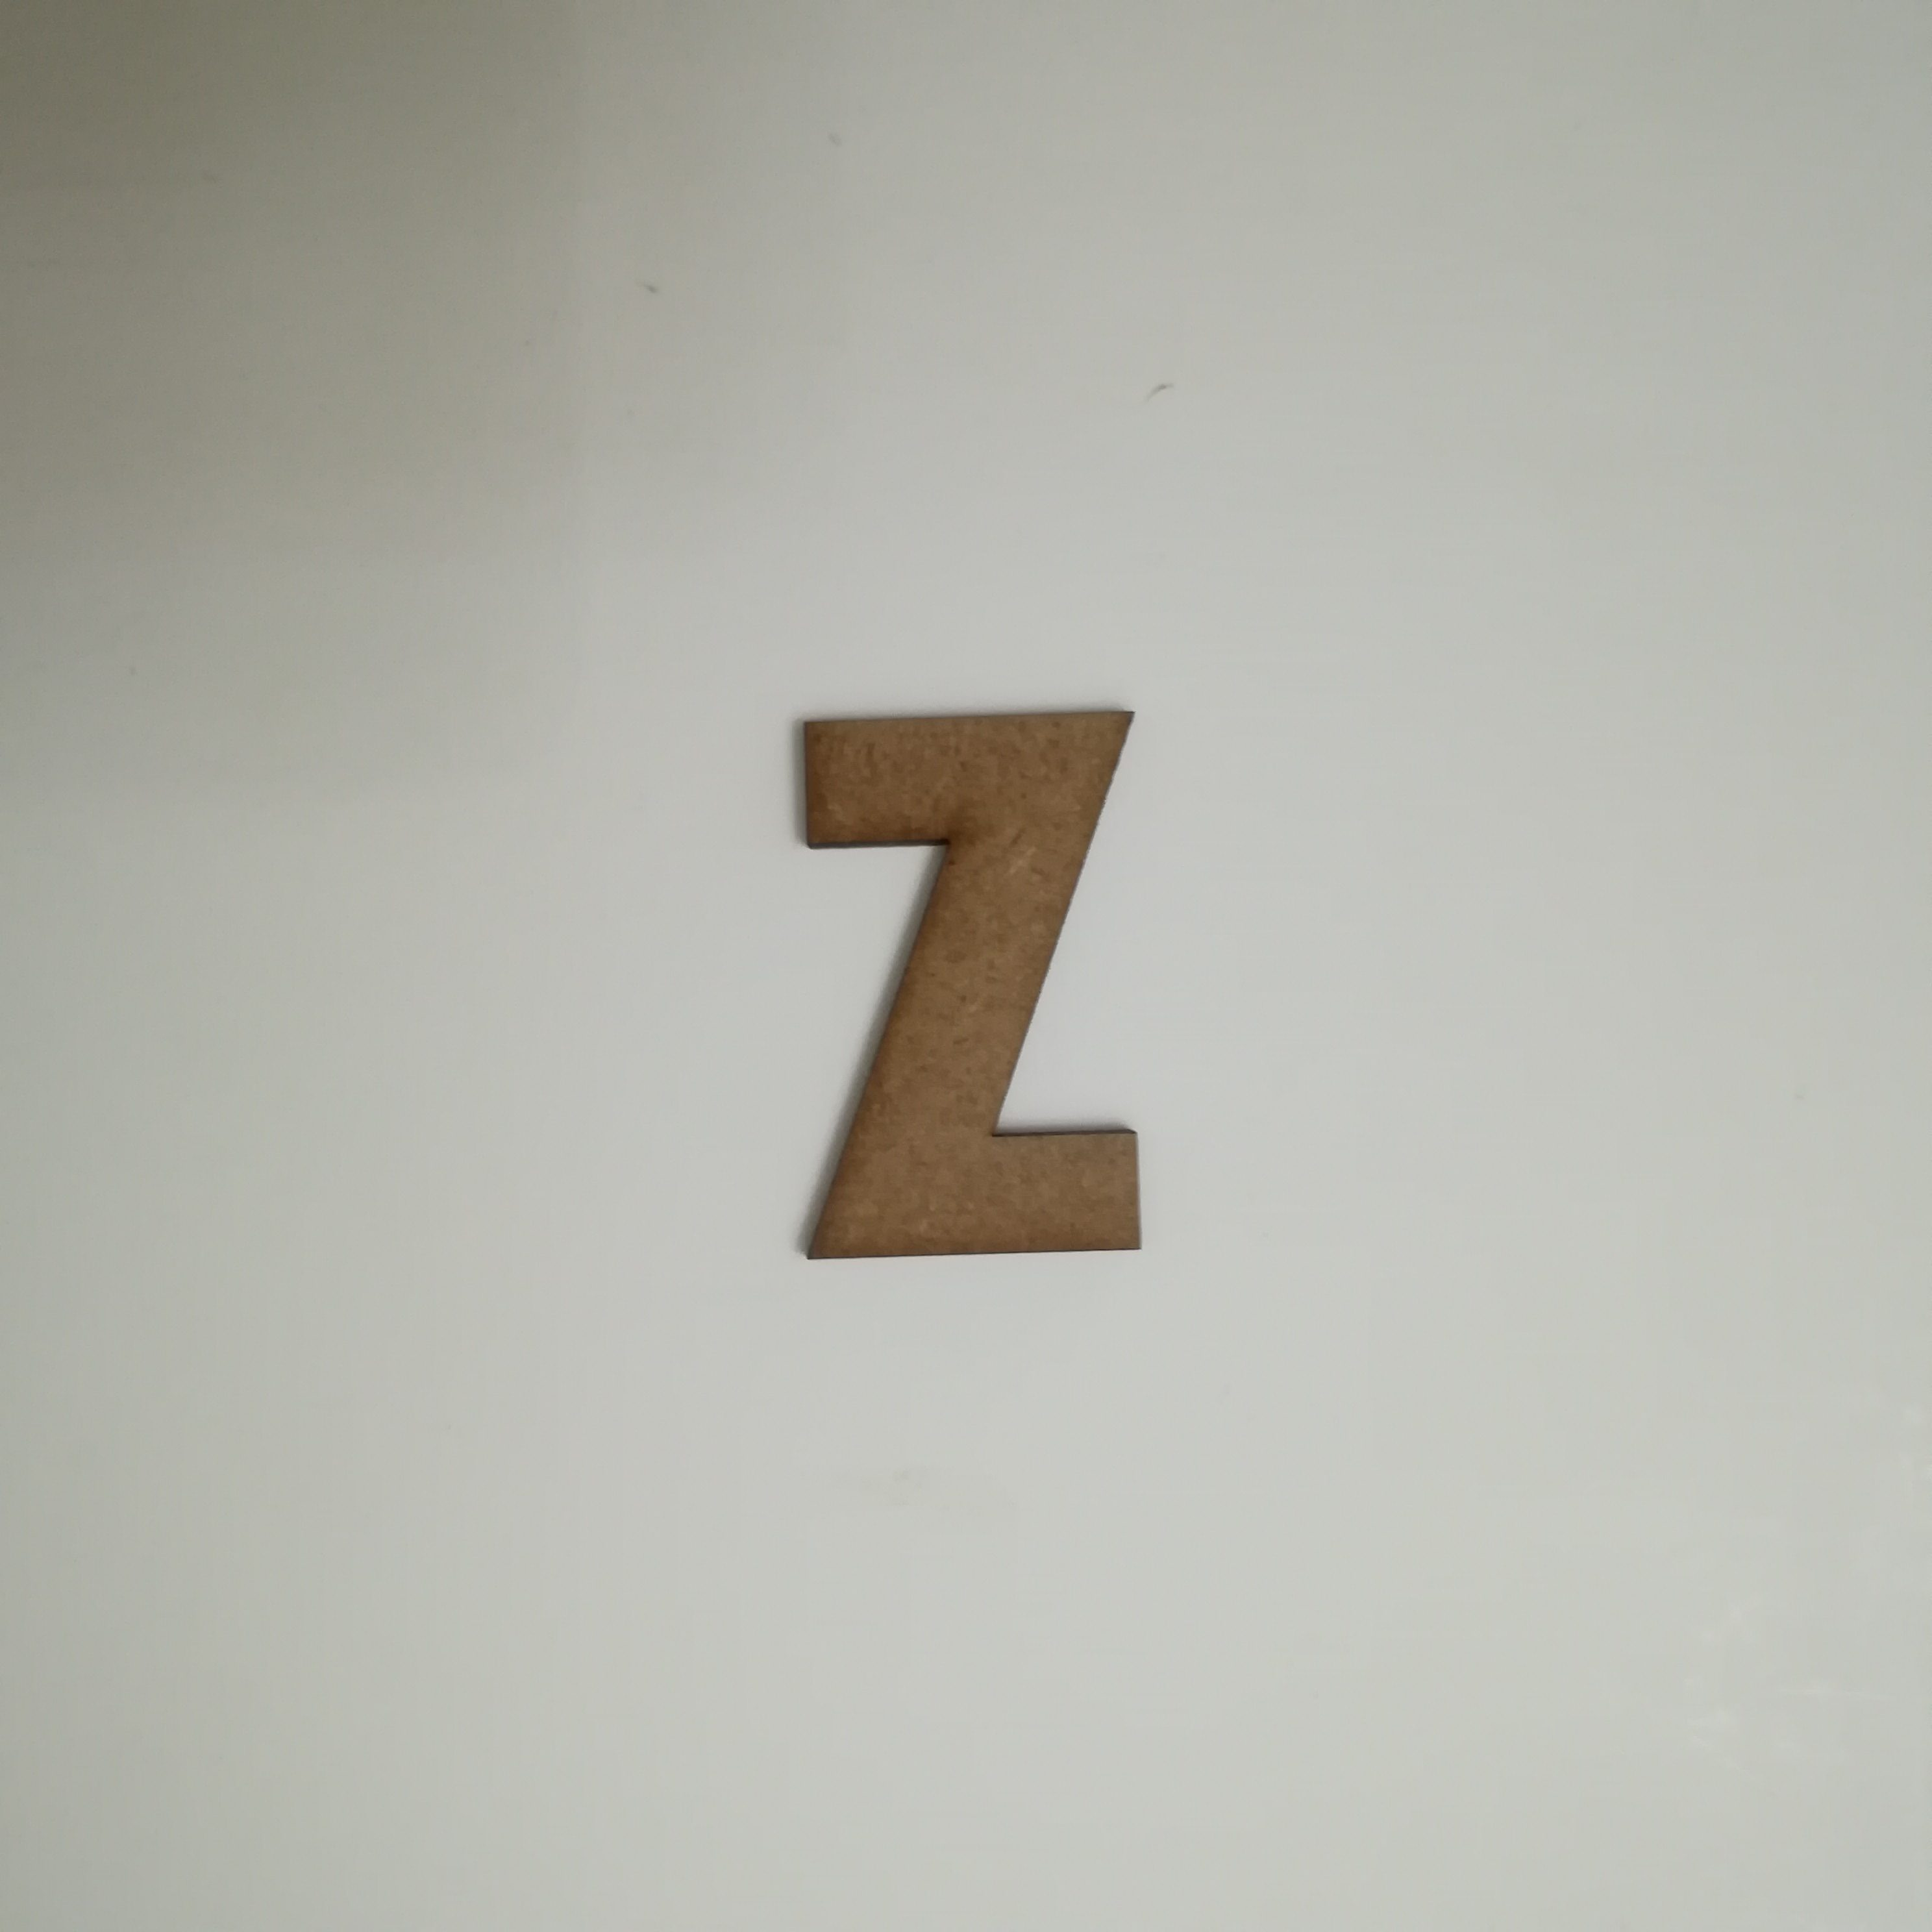 Letra Y capital minuscula